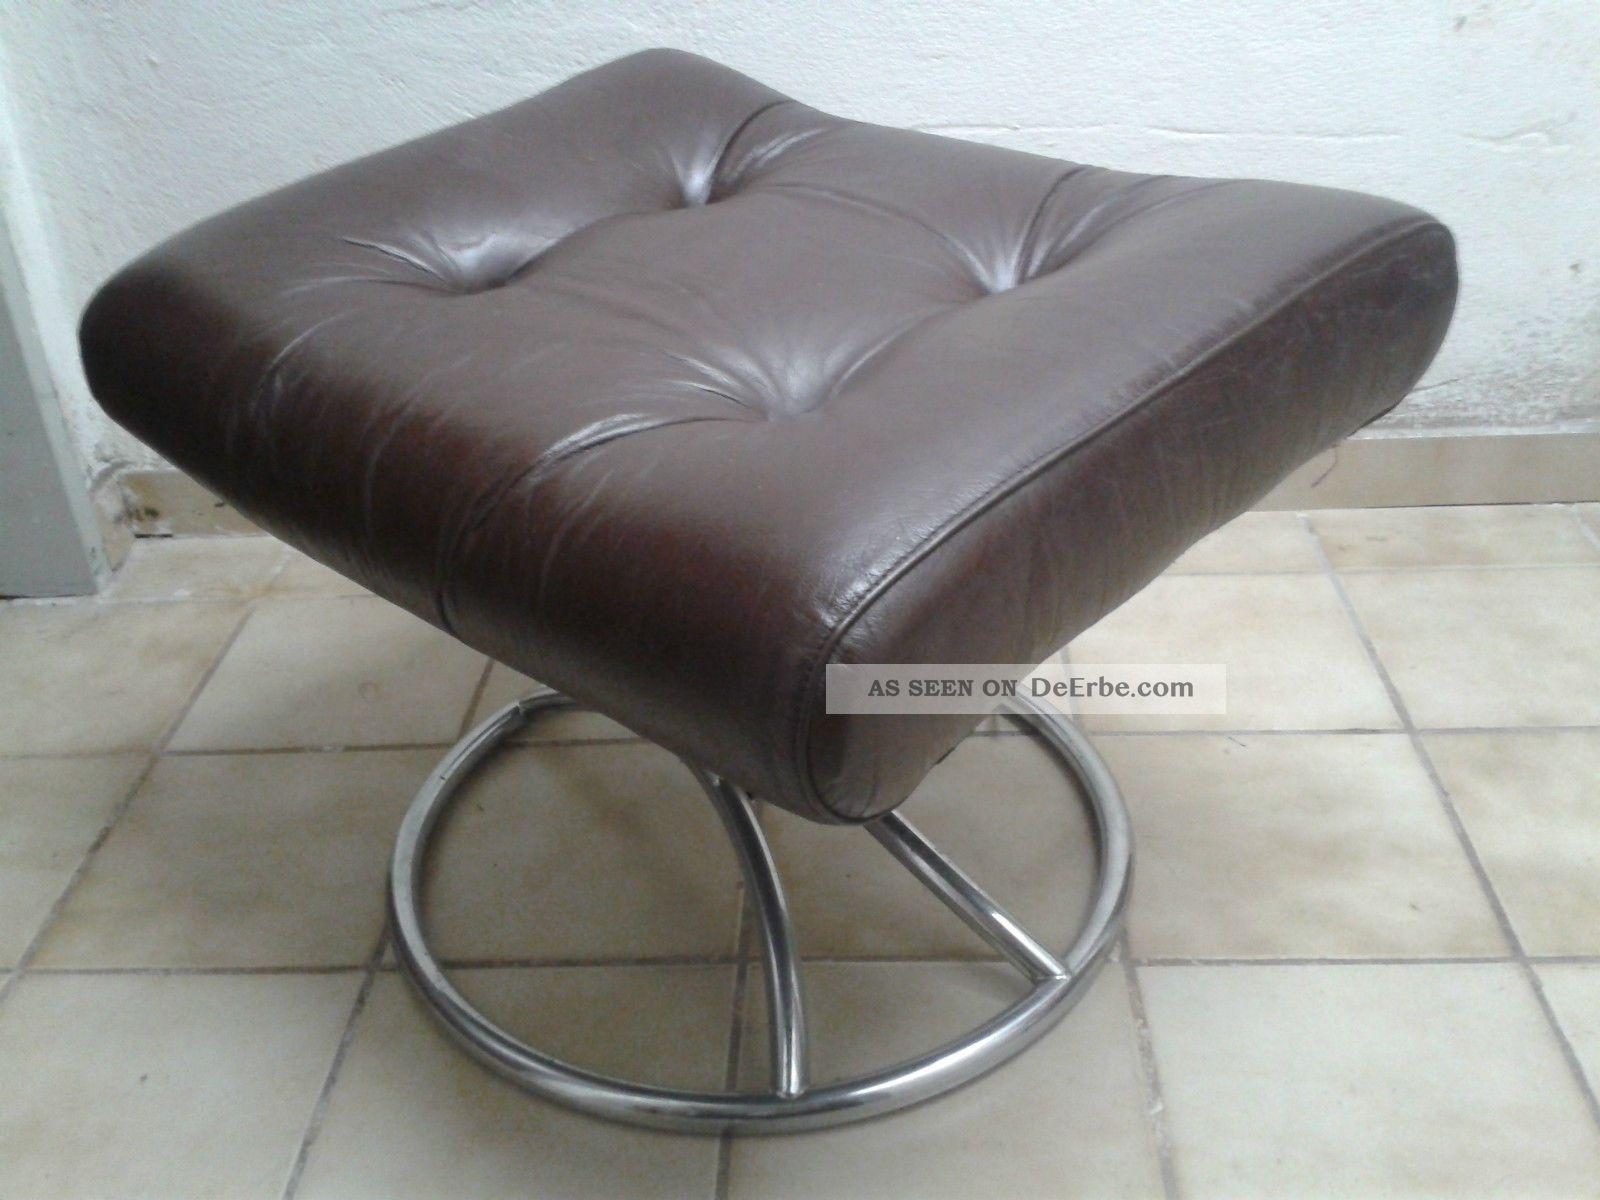 fusshocker hocker sessel ottomane eames knoll panton. Black Bedroom Furniture Sets. Home Design Ideas